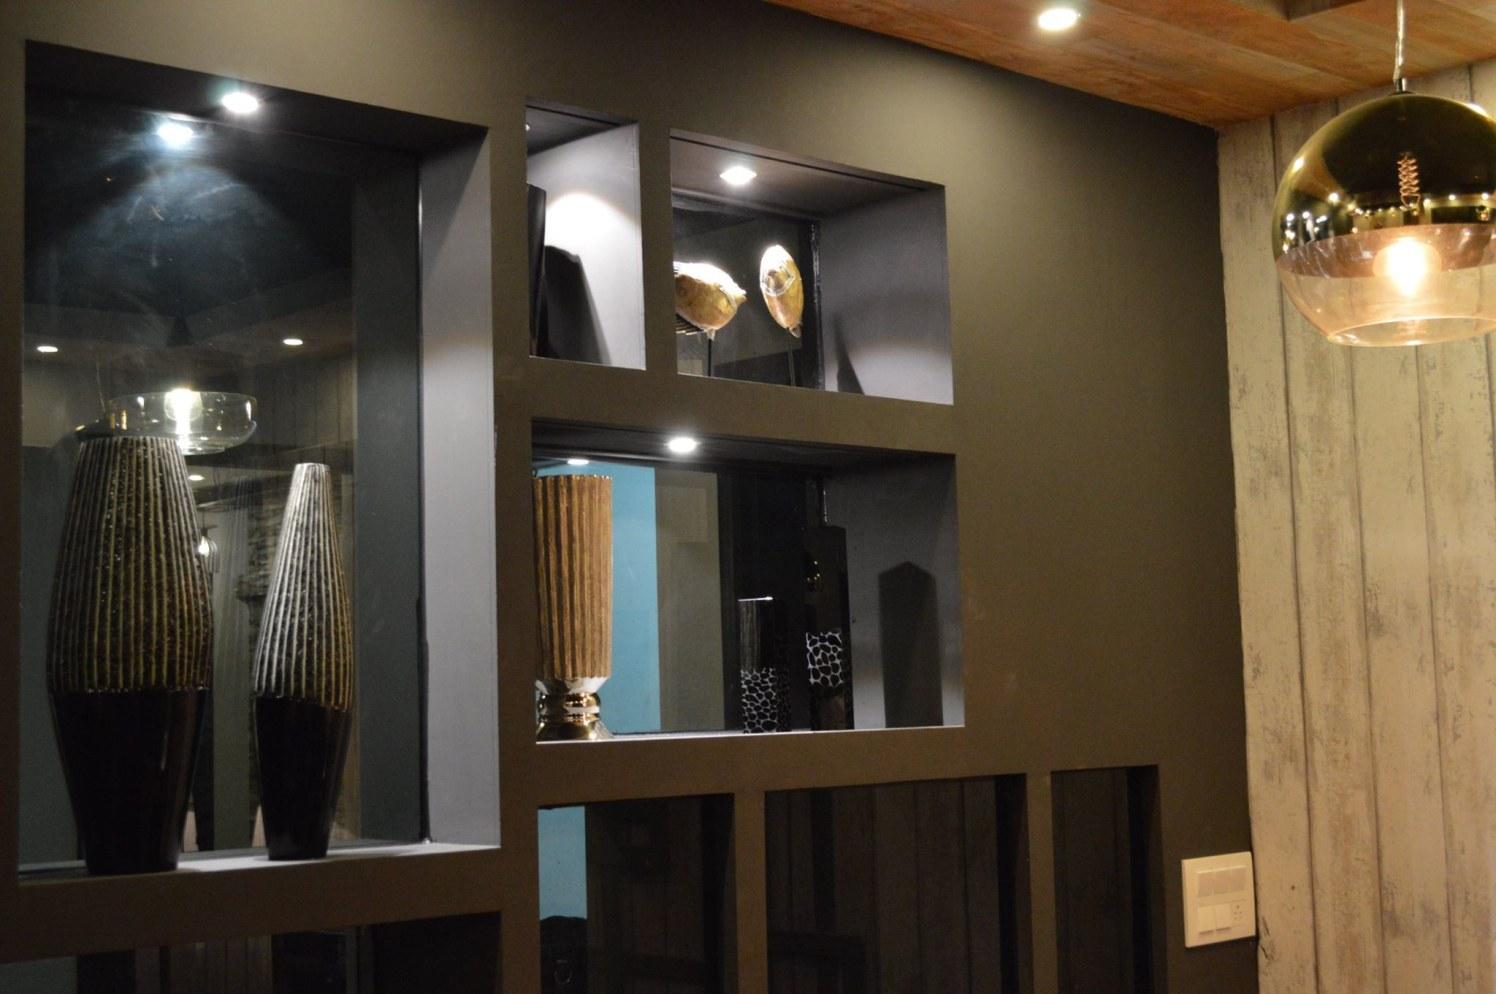 The Vase Showcase by Urban Upgrade Interiors Modern | Interior Design Photos & Ideas